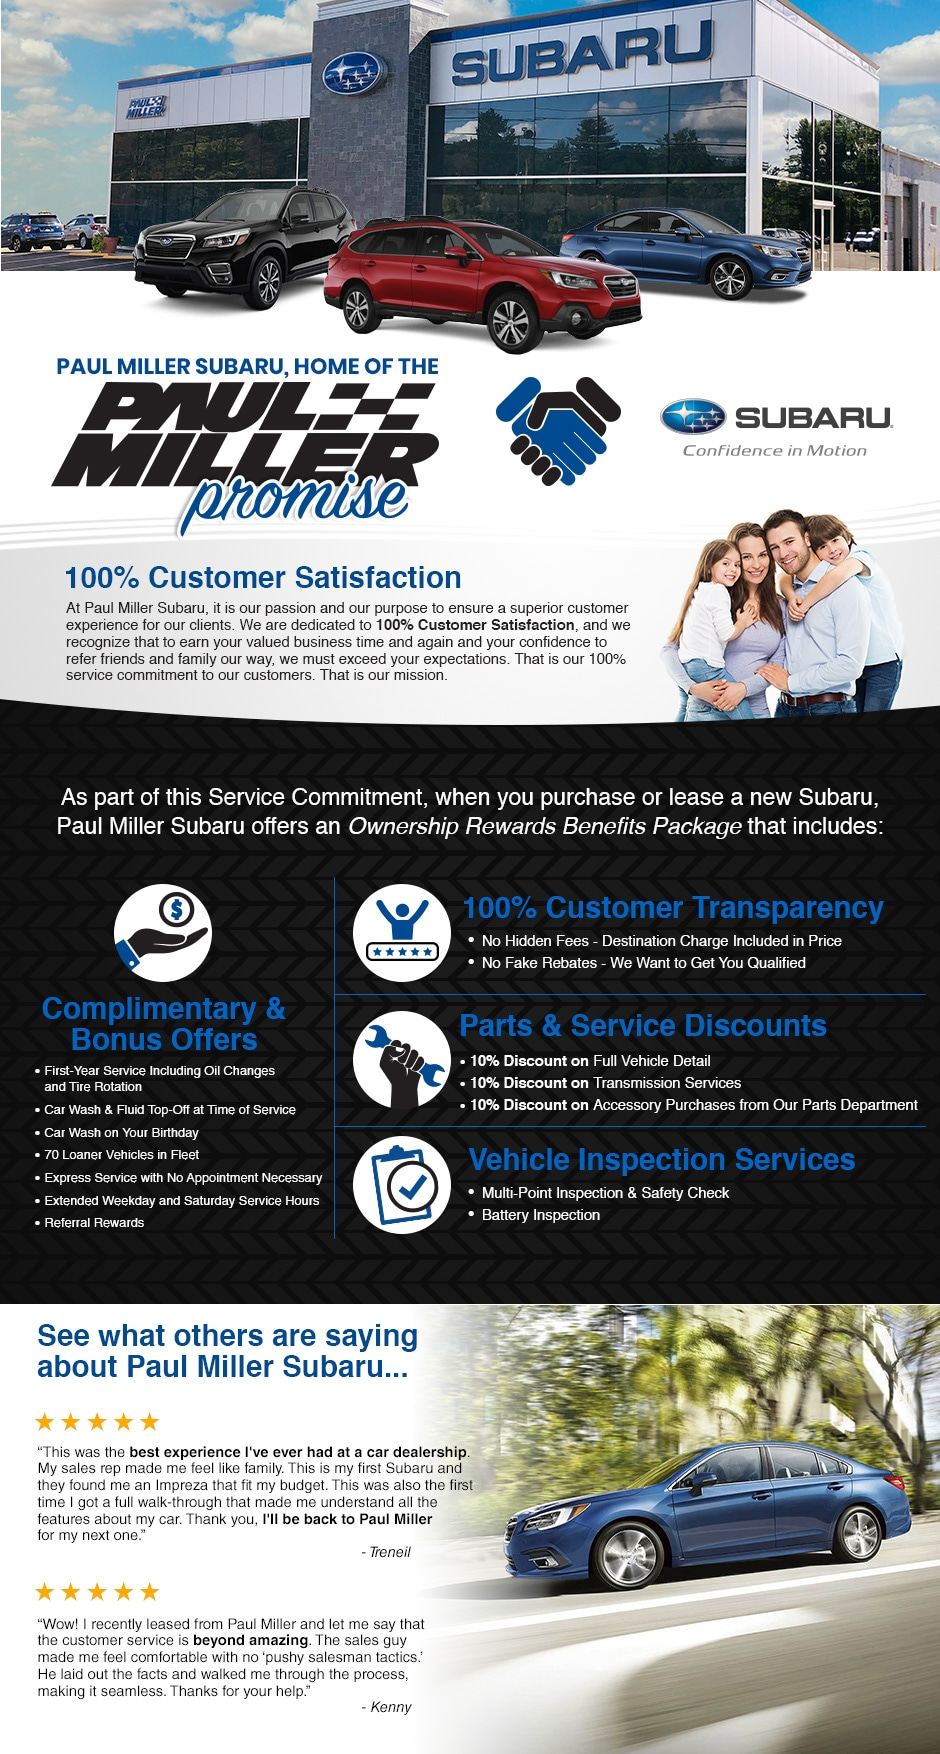 Subaru Dealers Nj >> About Paul Miller Subaru Subaru Dealers In Nj